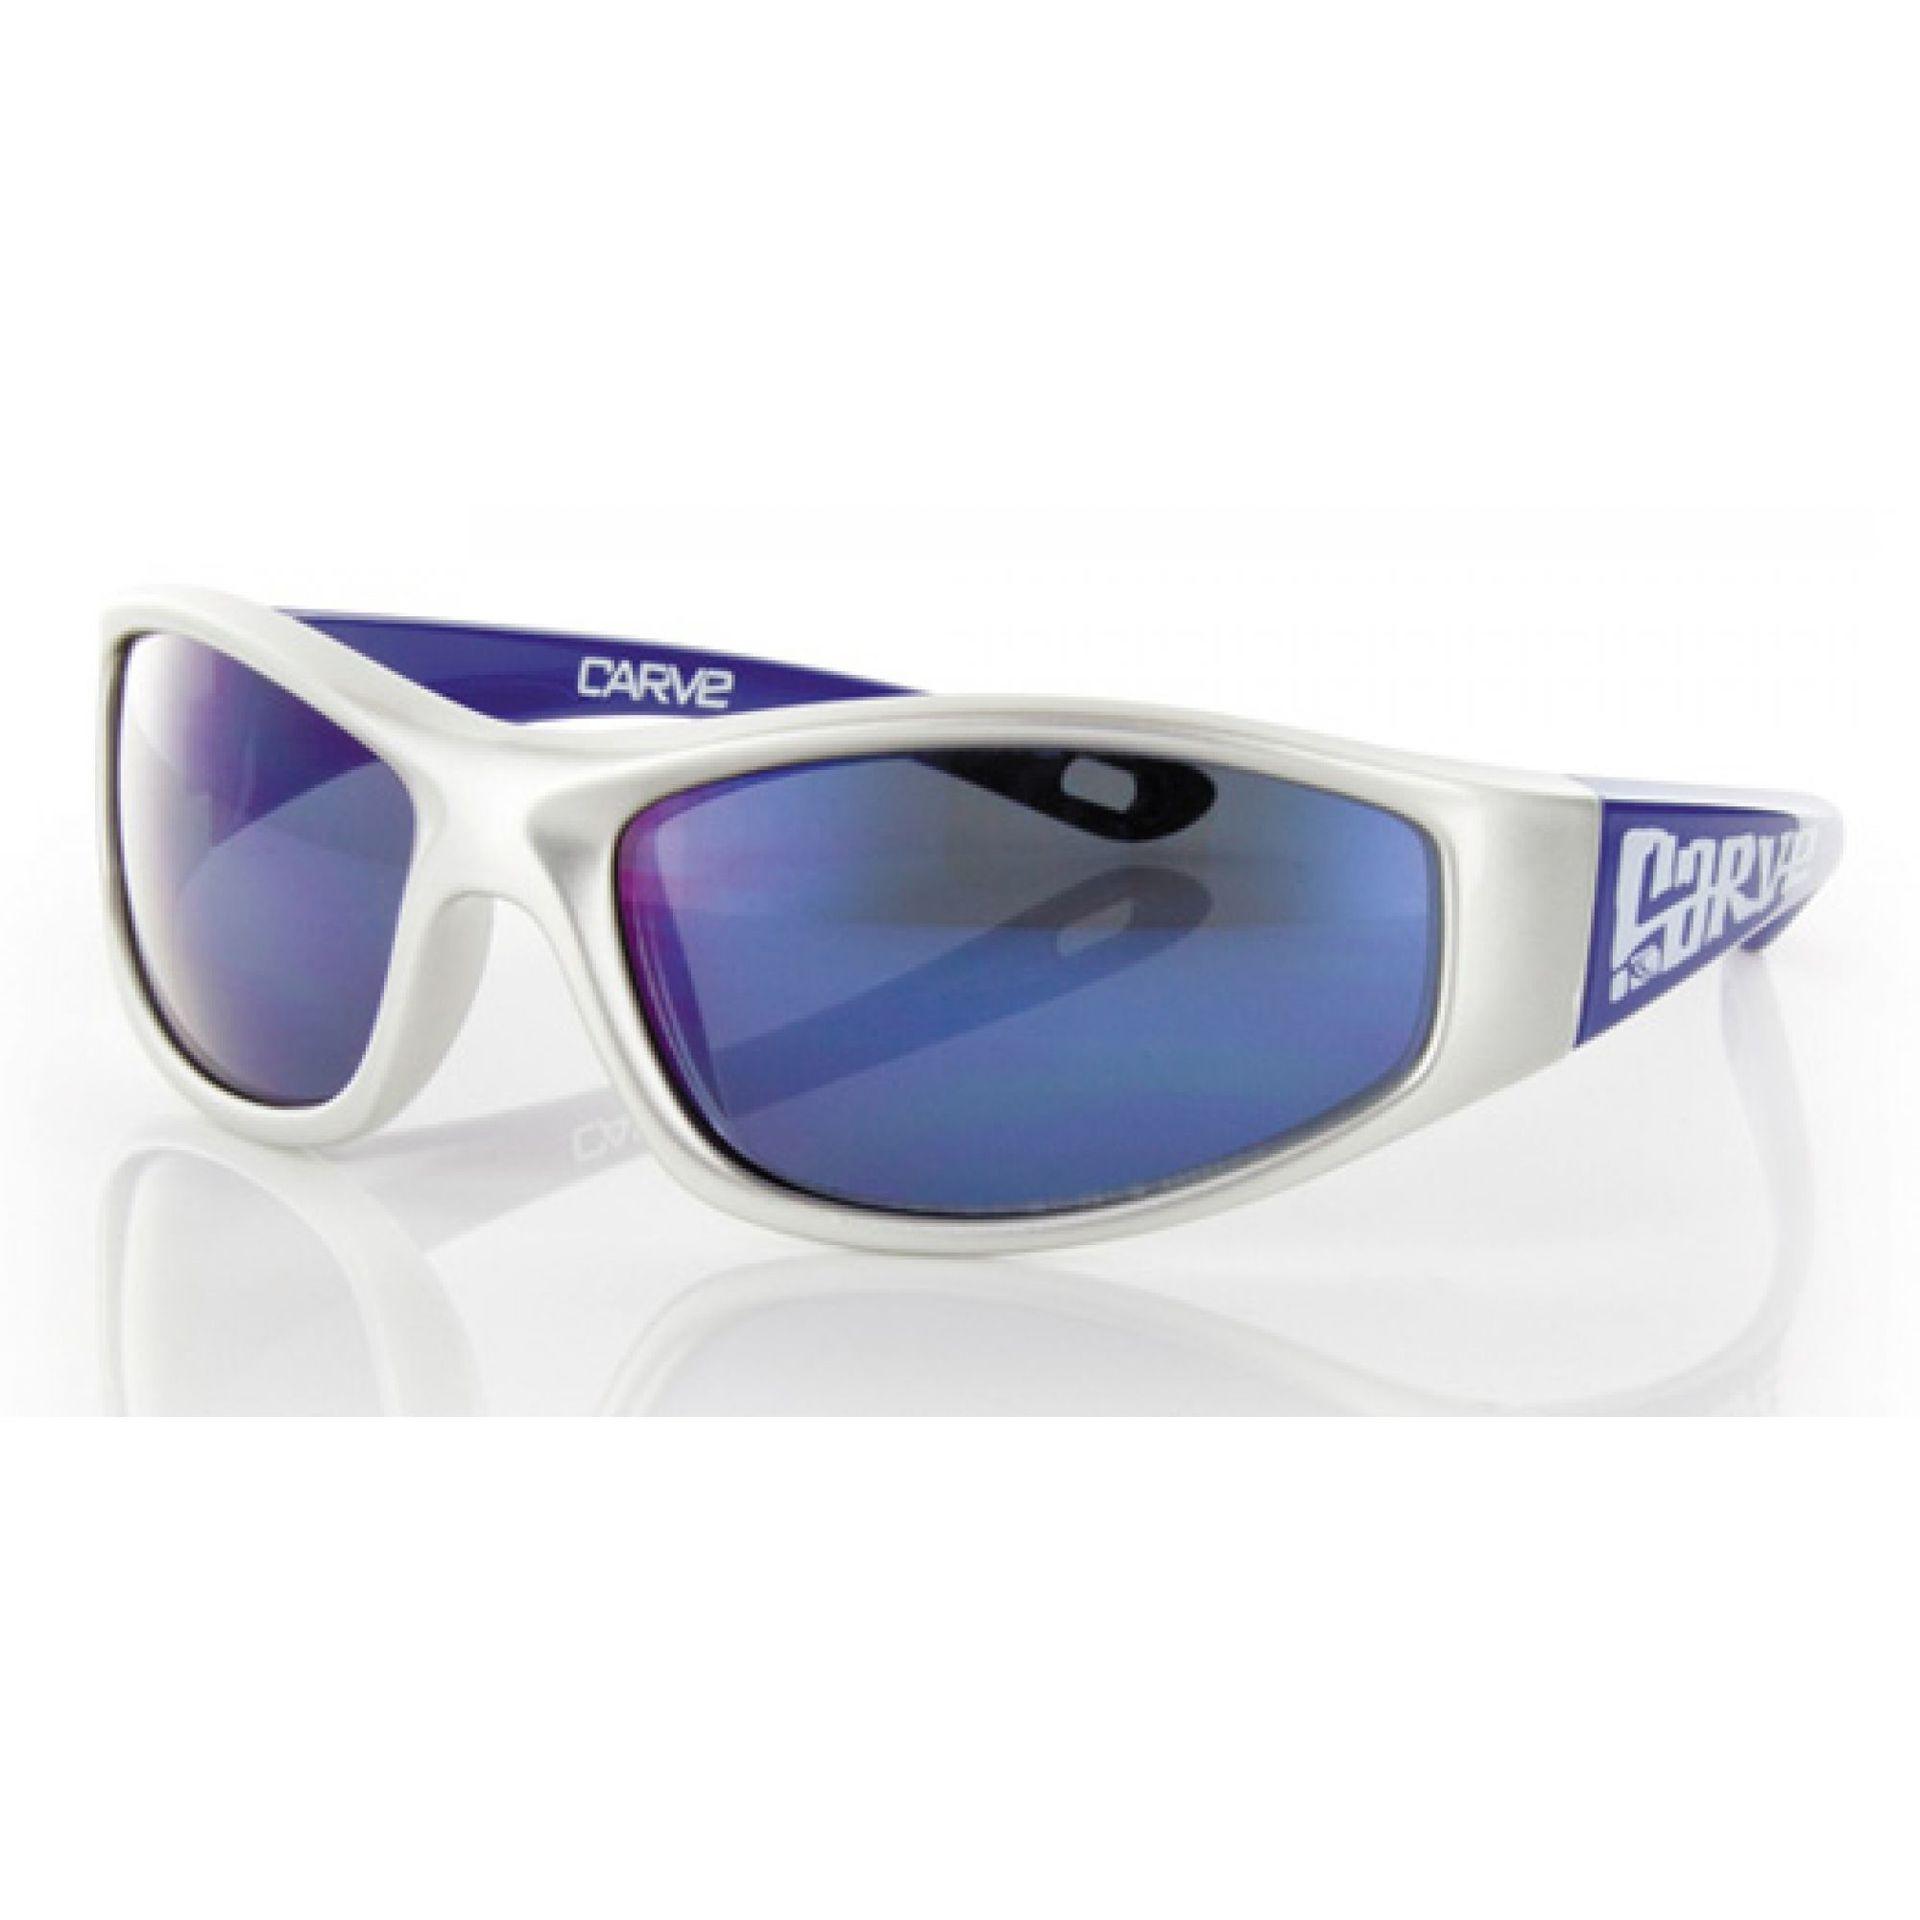 Okulary Carve Playground srebrno niebieskie